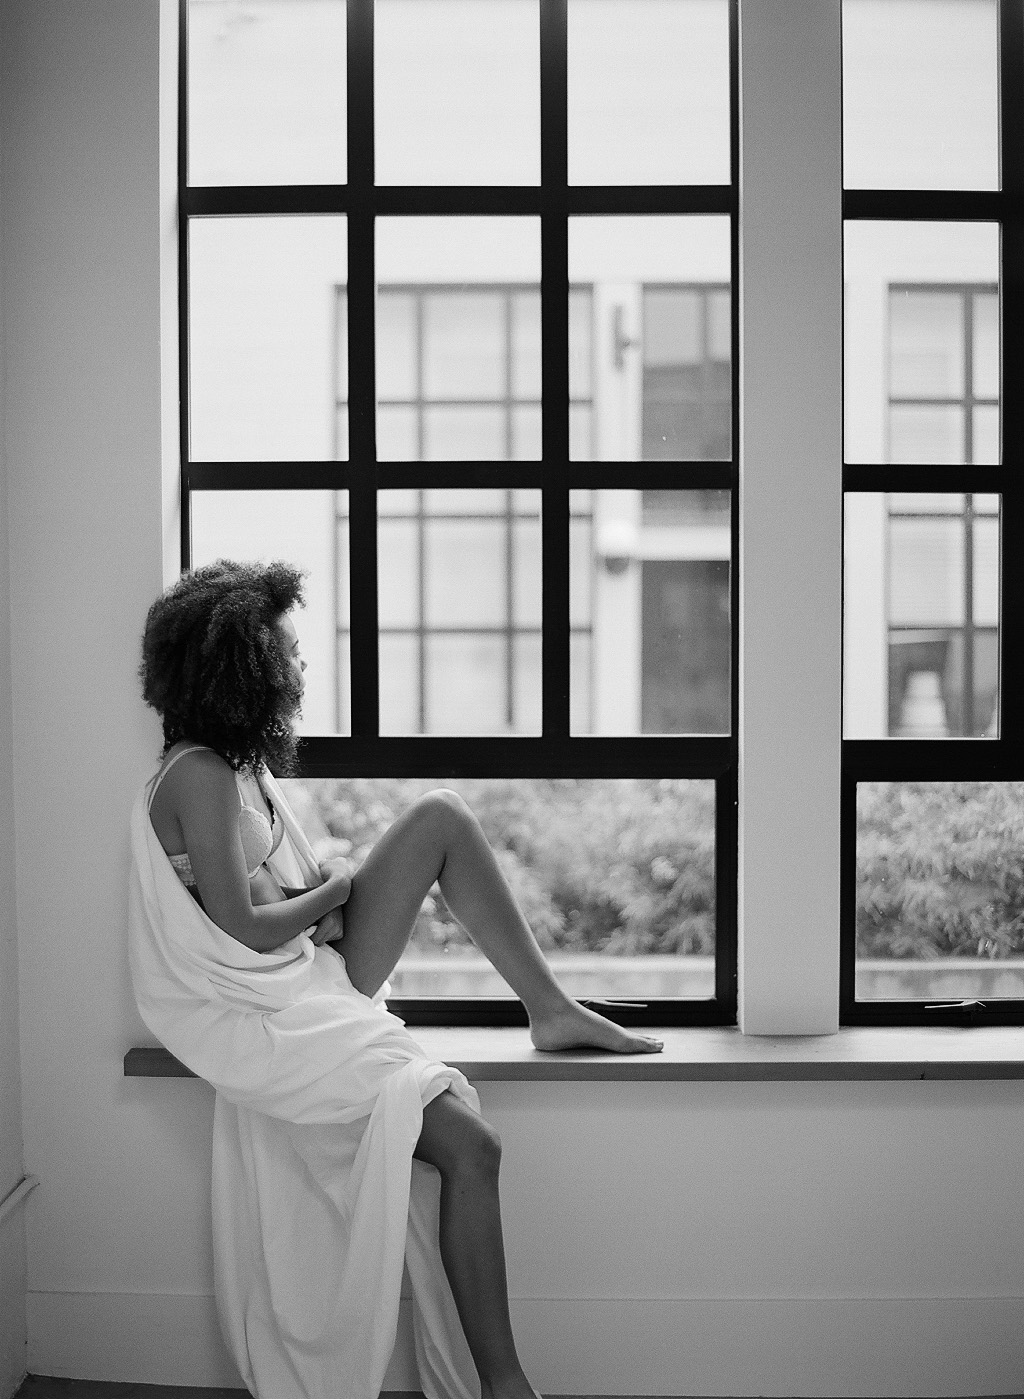 Lexia Frank is a portland oregon boudoir photographer who shoots film for boudoir sessions in portland PORTLAND OREGON COMMERCIAL PHOTOGRAPHY, PORTLAND OREGON BOUDOIR PHOTOGRAPHY, WWW DOT LEXIAFRANK DOT COM